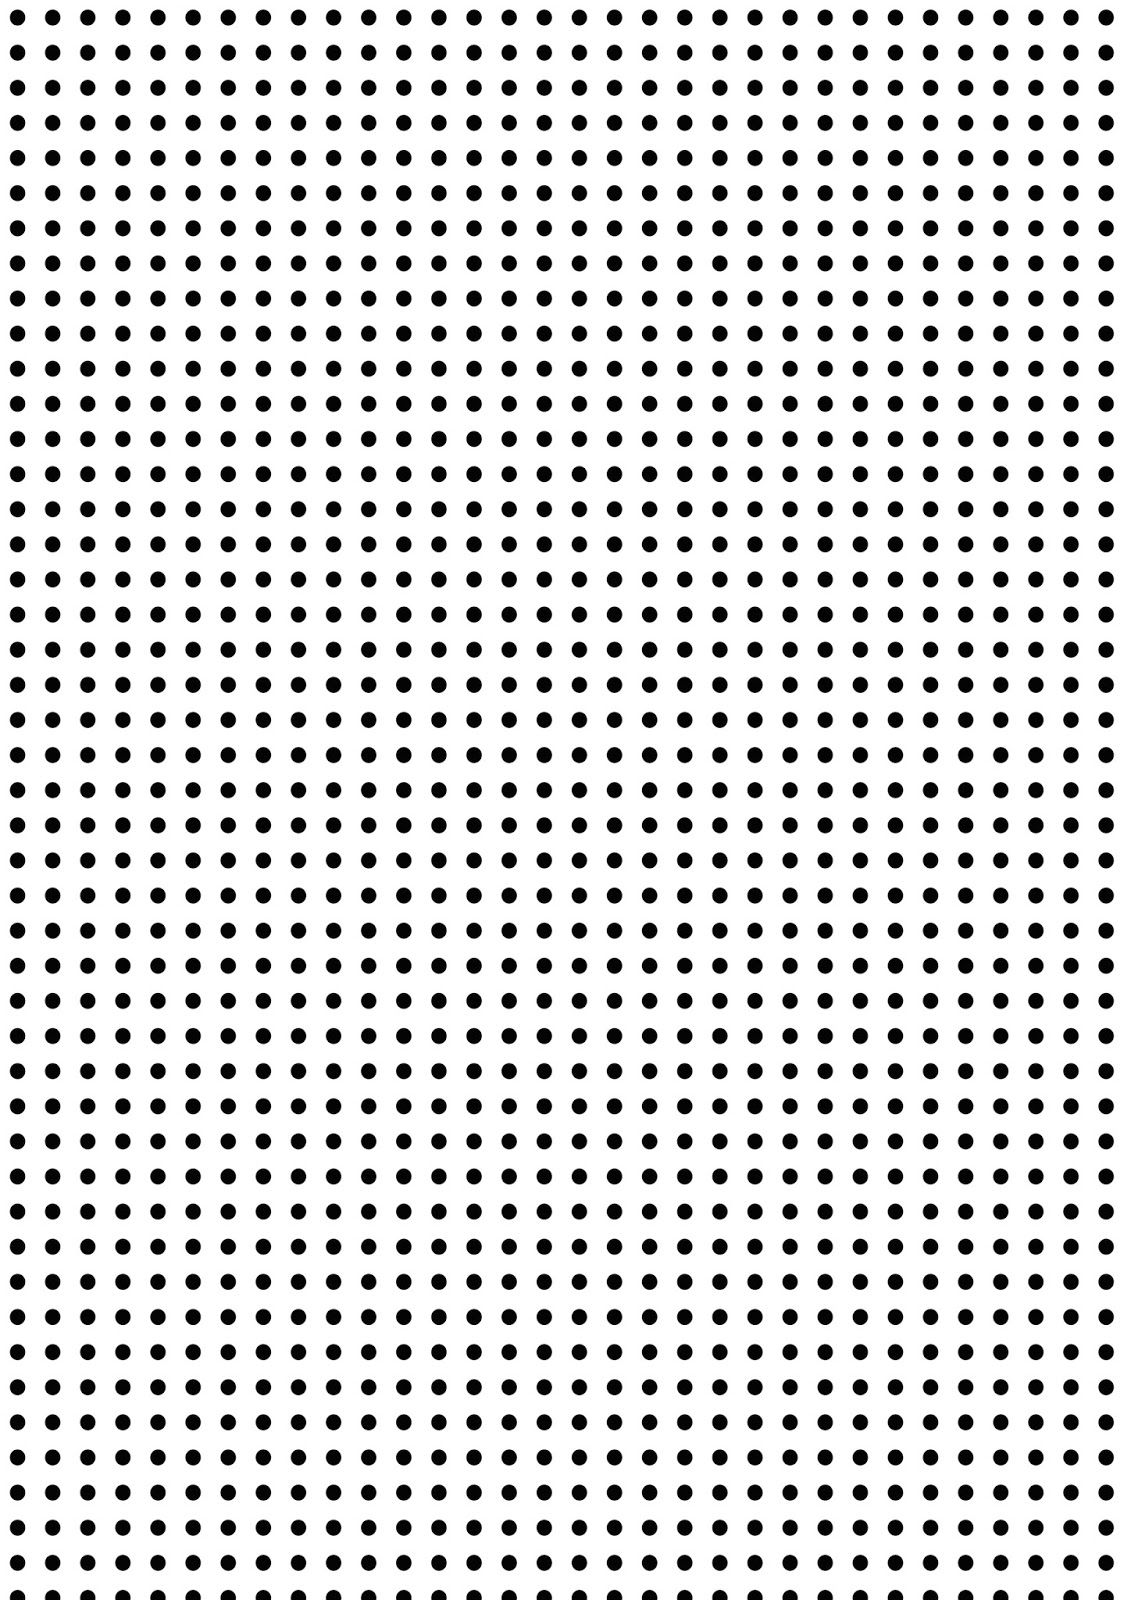 Worksheet Pattern Printable free printable black and white dots pattern paper kolorowe paper